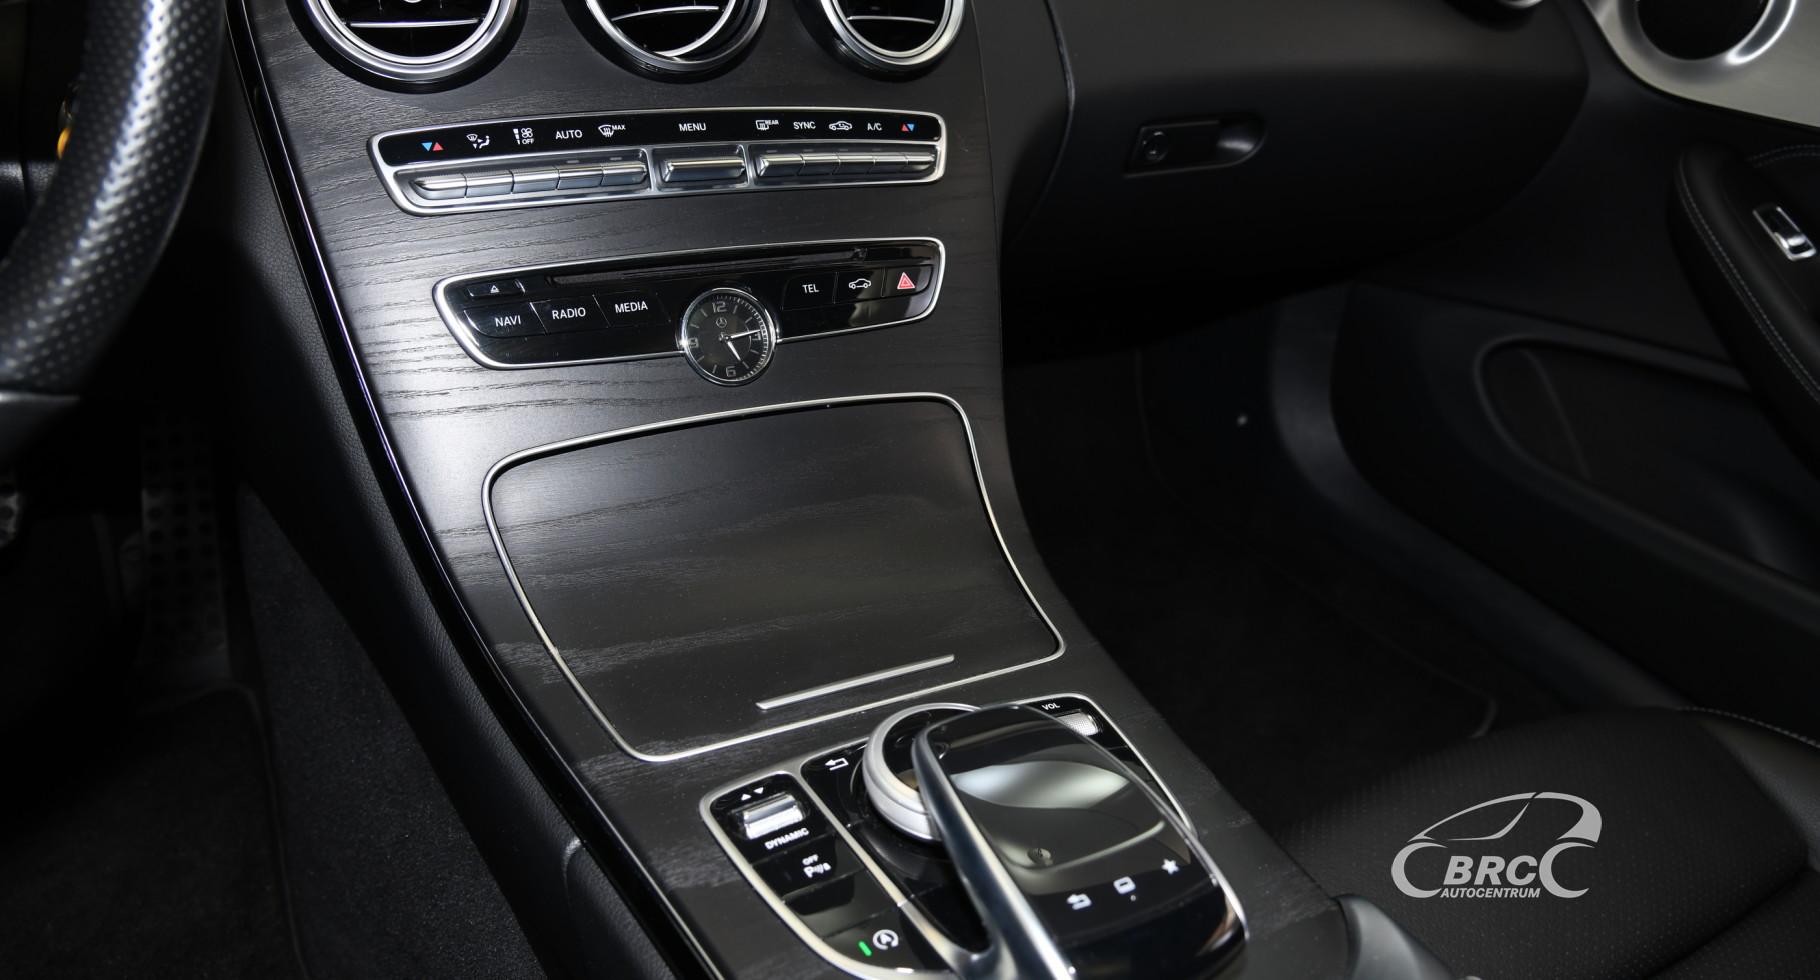 Mercedes-Benz C 250 Coupe AMG Automatas